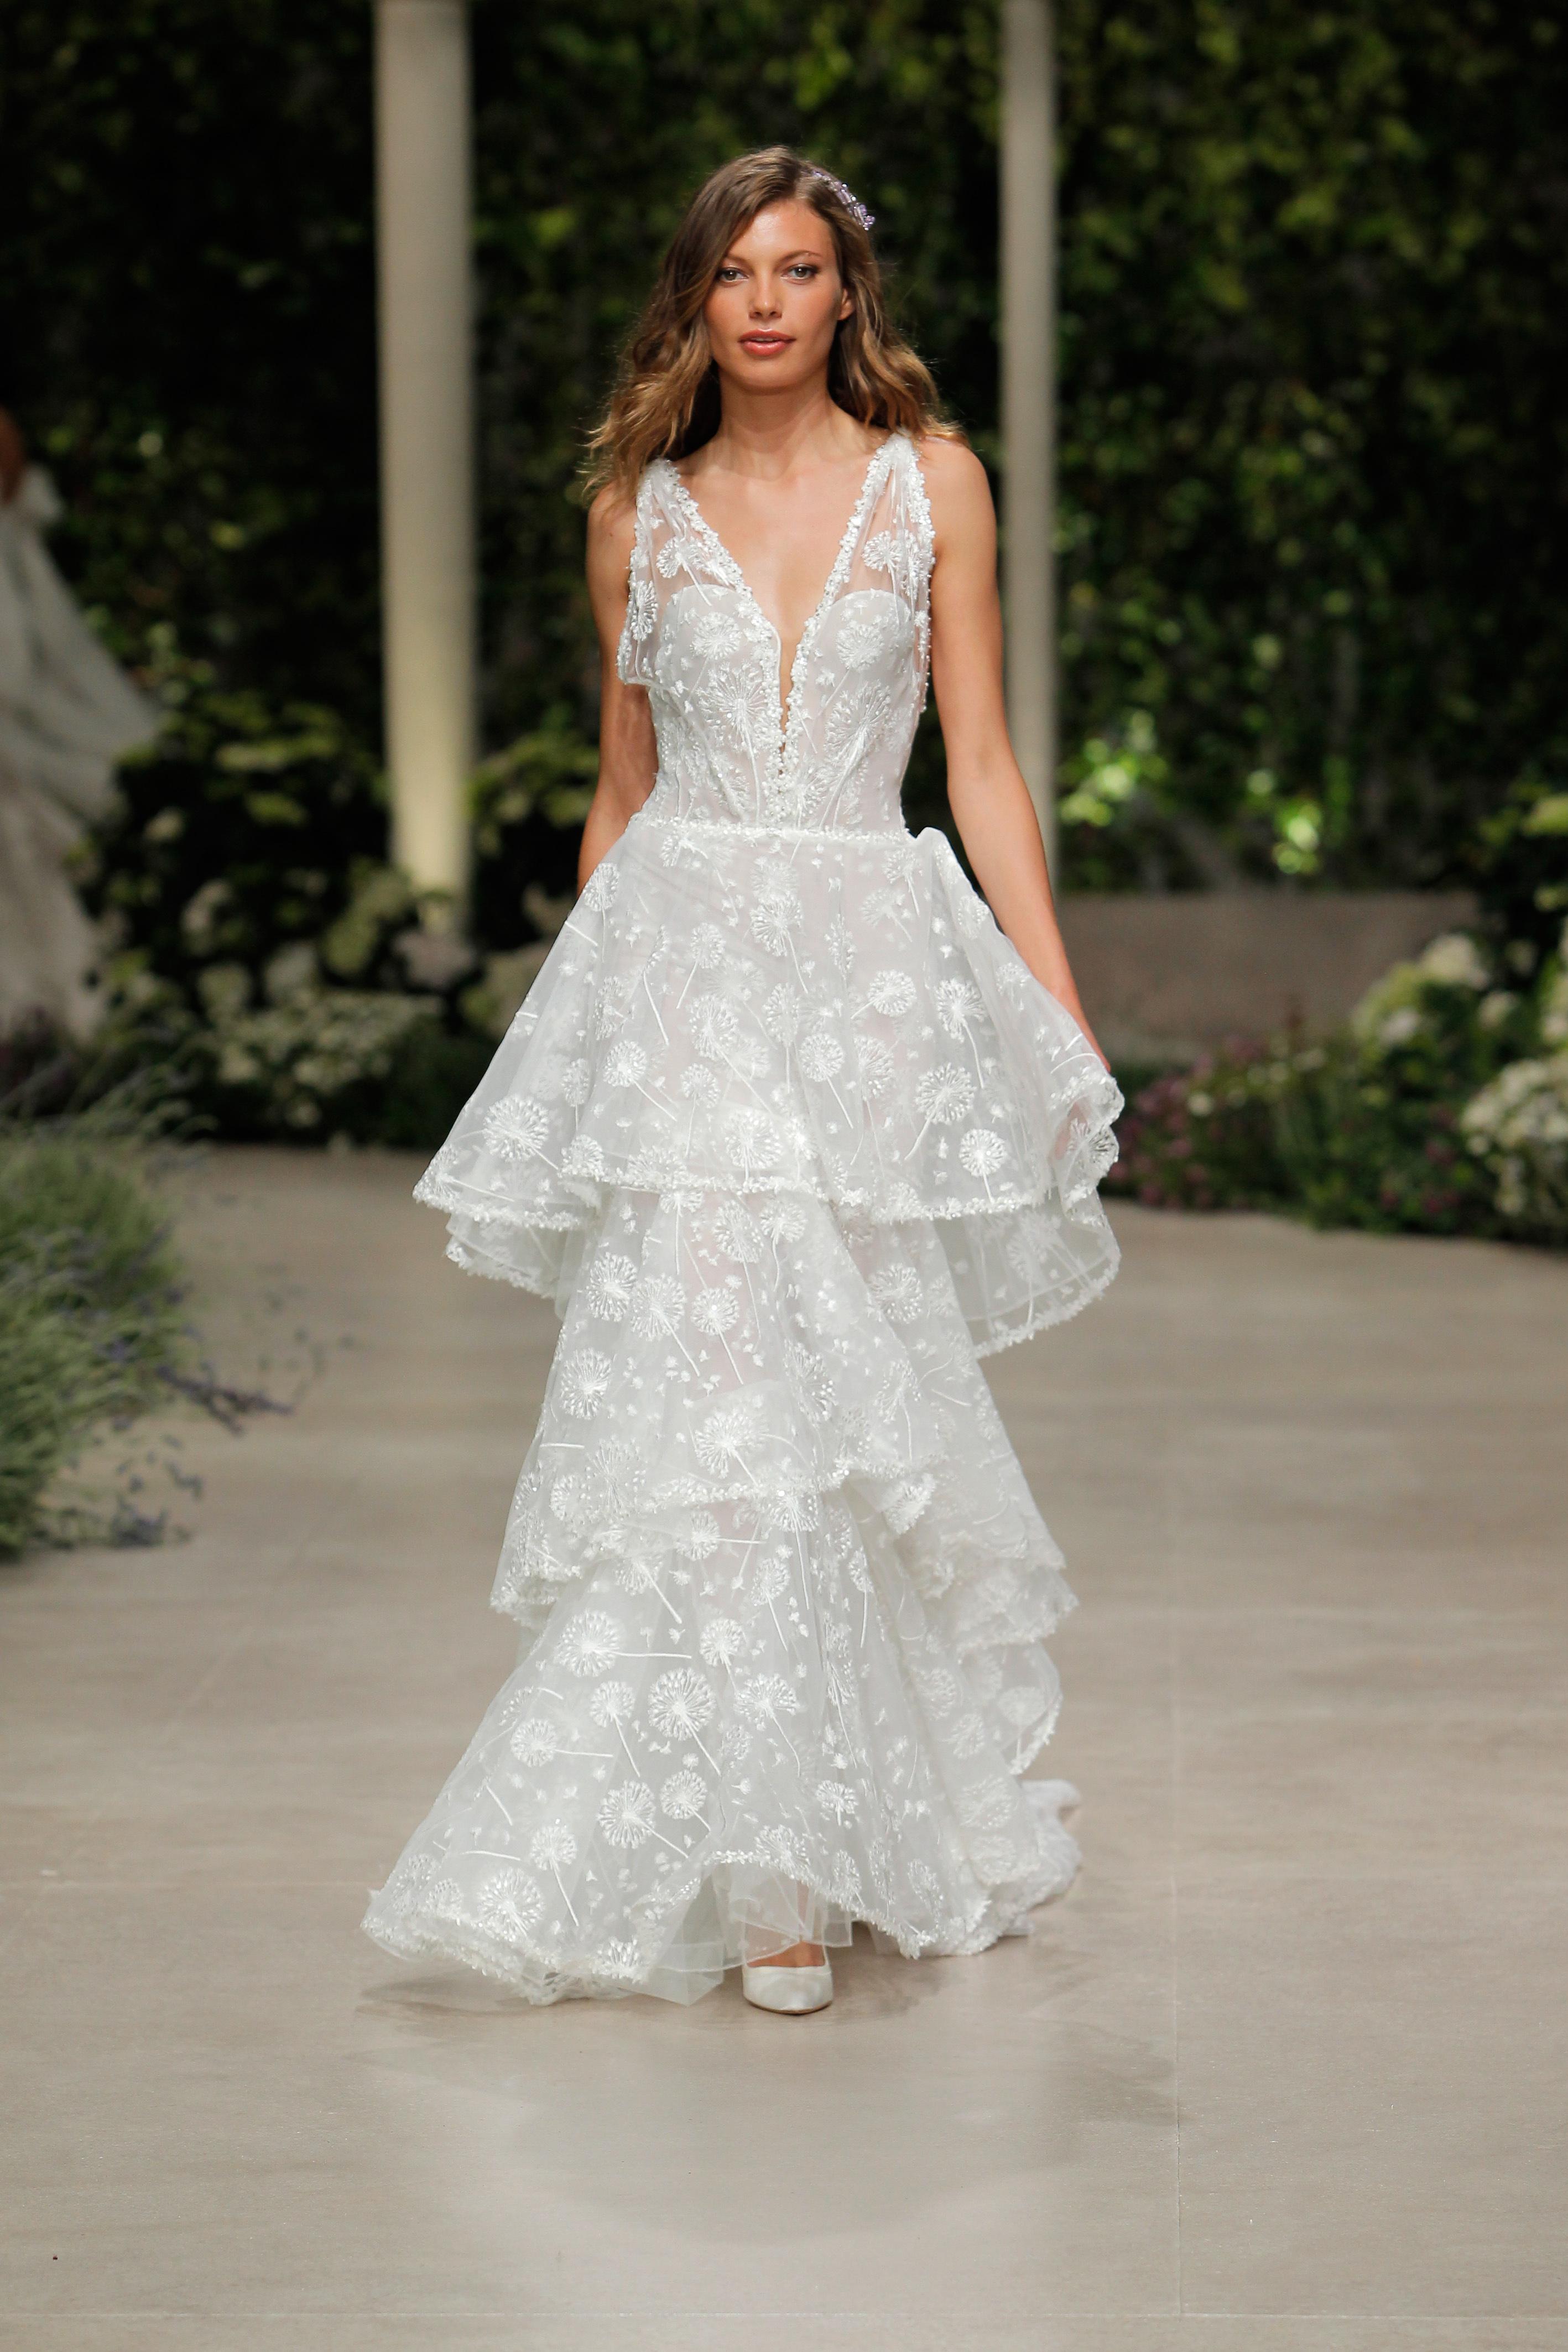 pronovias wedding dress spring 2019 tiered lace dress